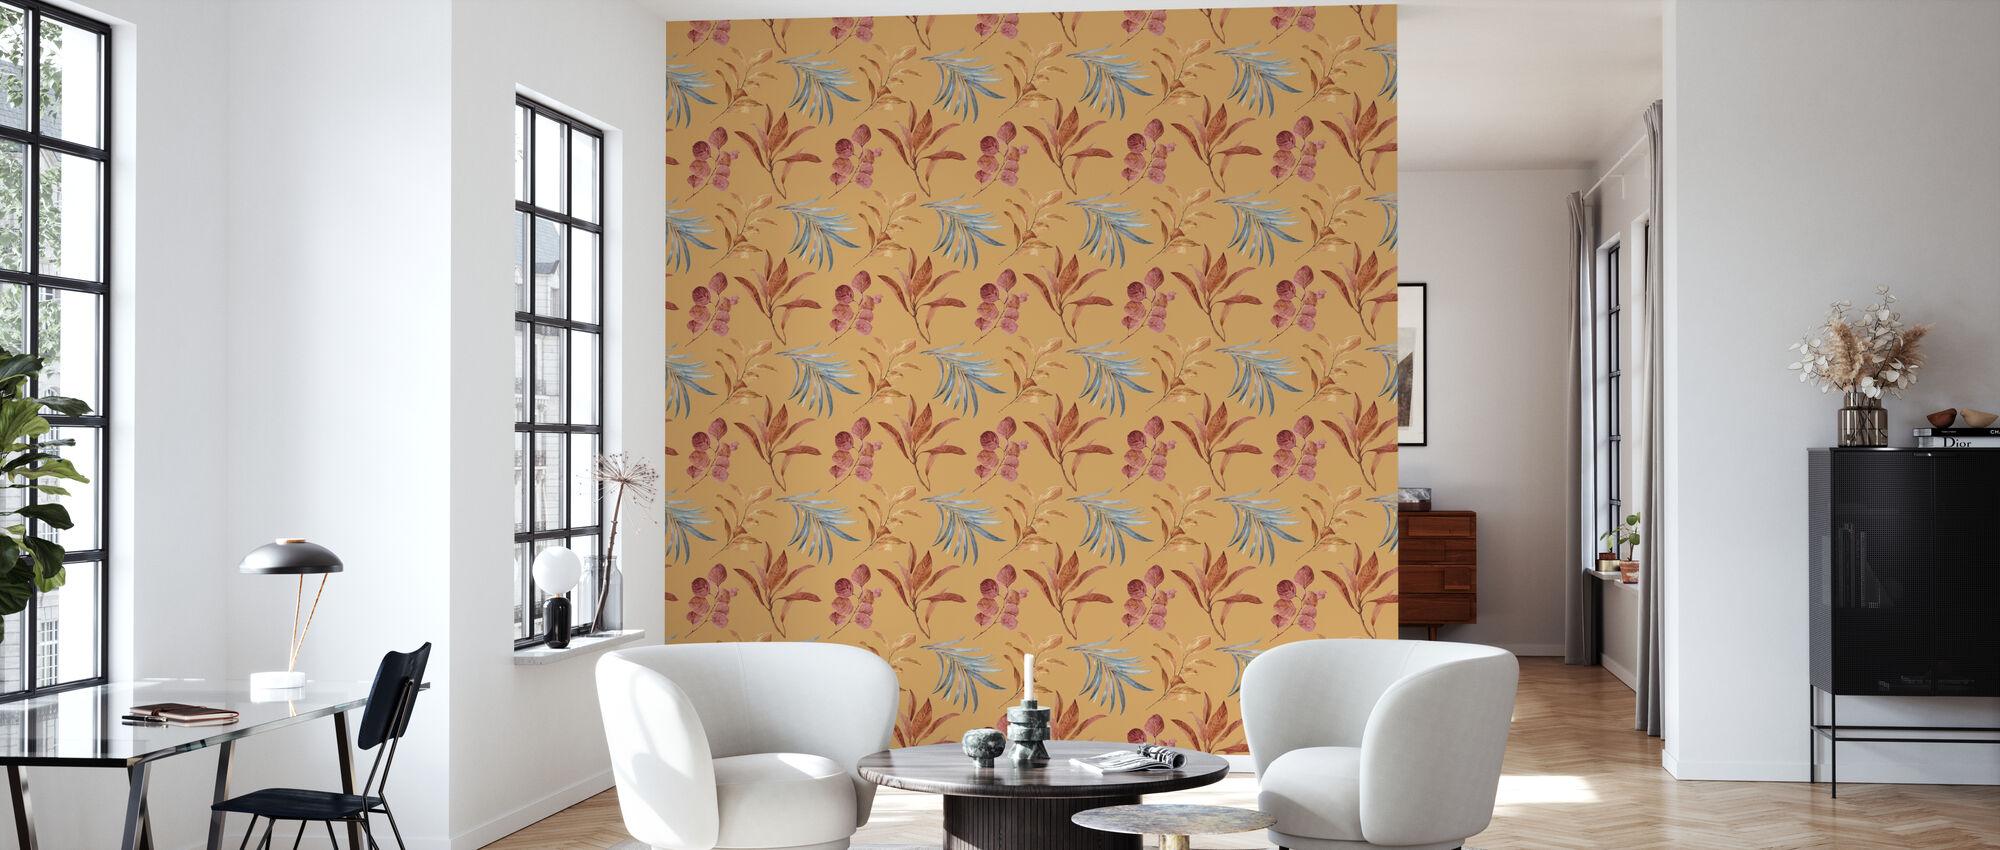 Terra - Golden Cliff - Wallpaper - Living Room